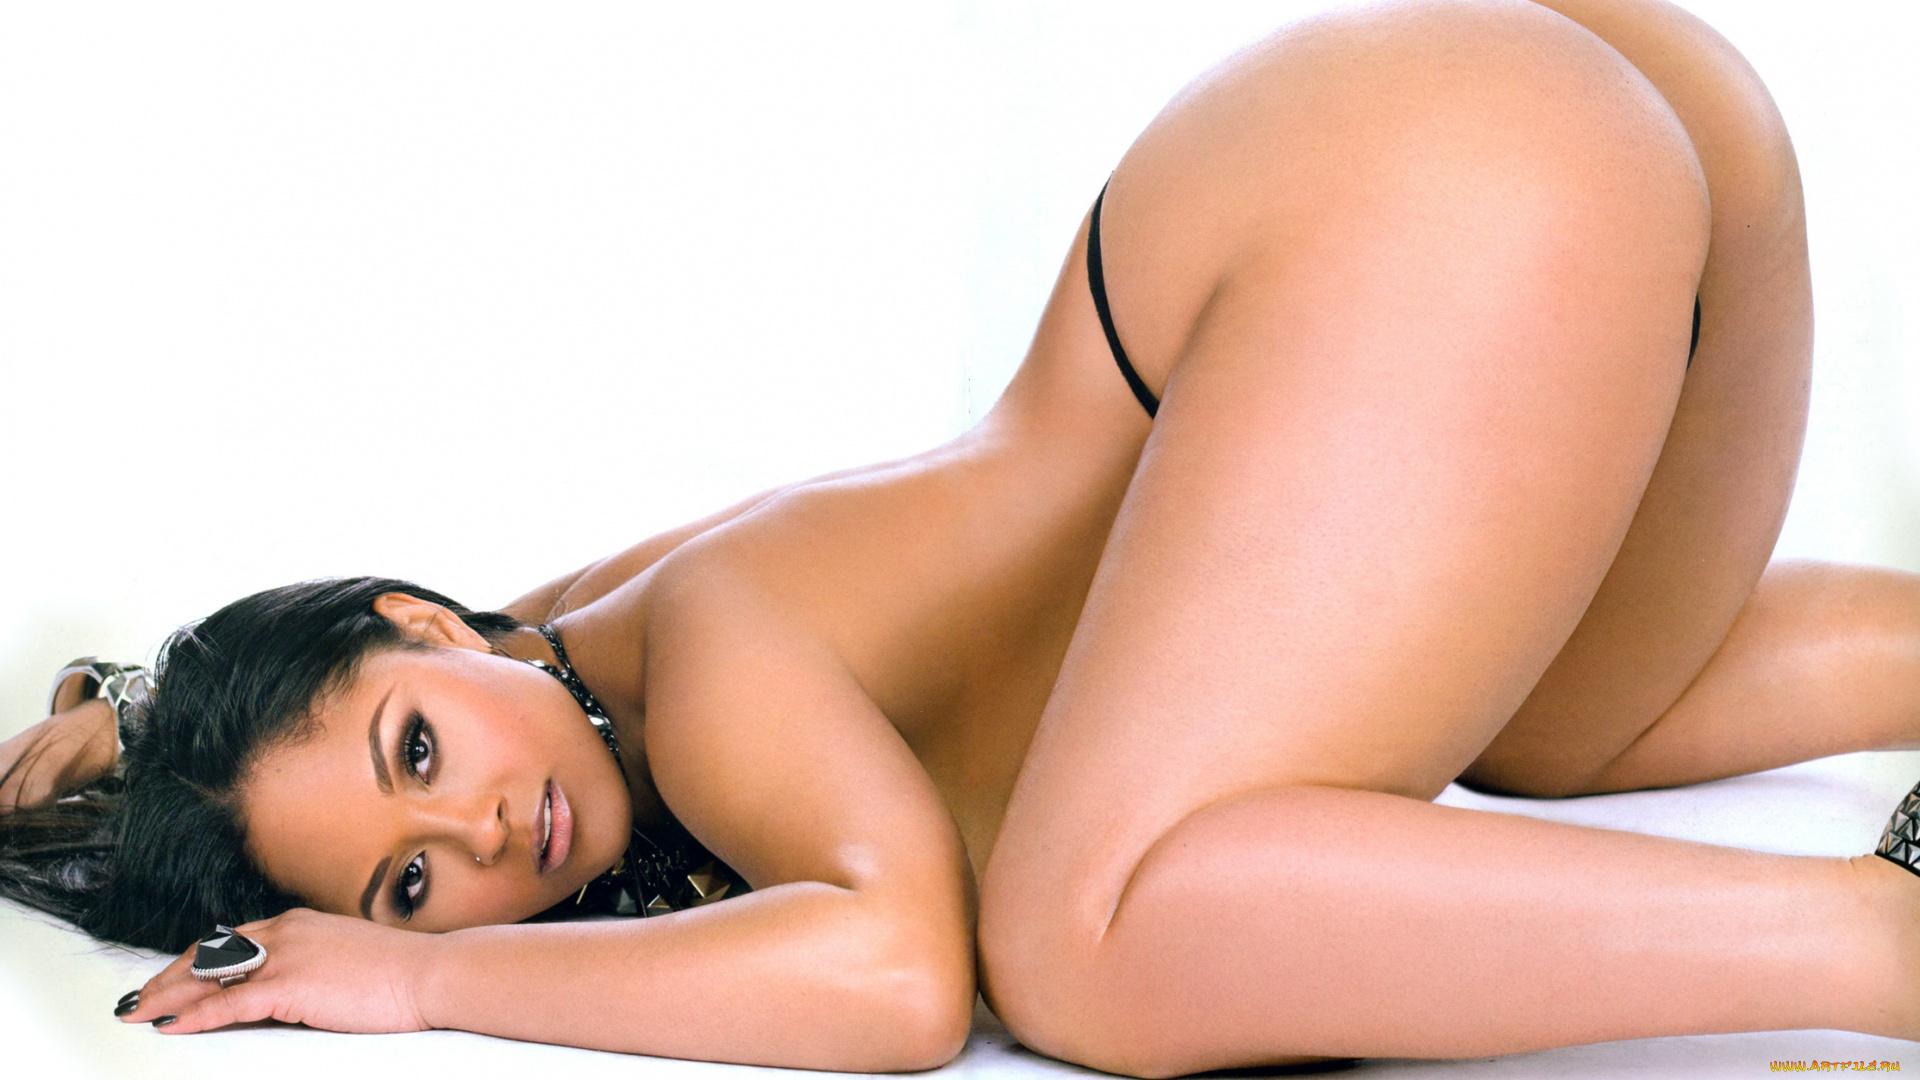 hip-hop-male-nudes-drew-sidora-nude-pic